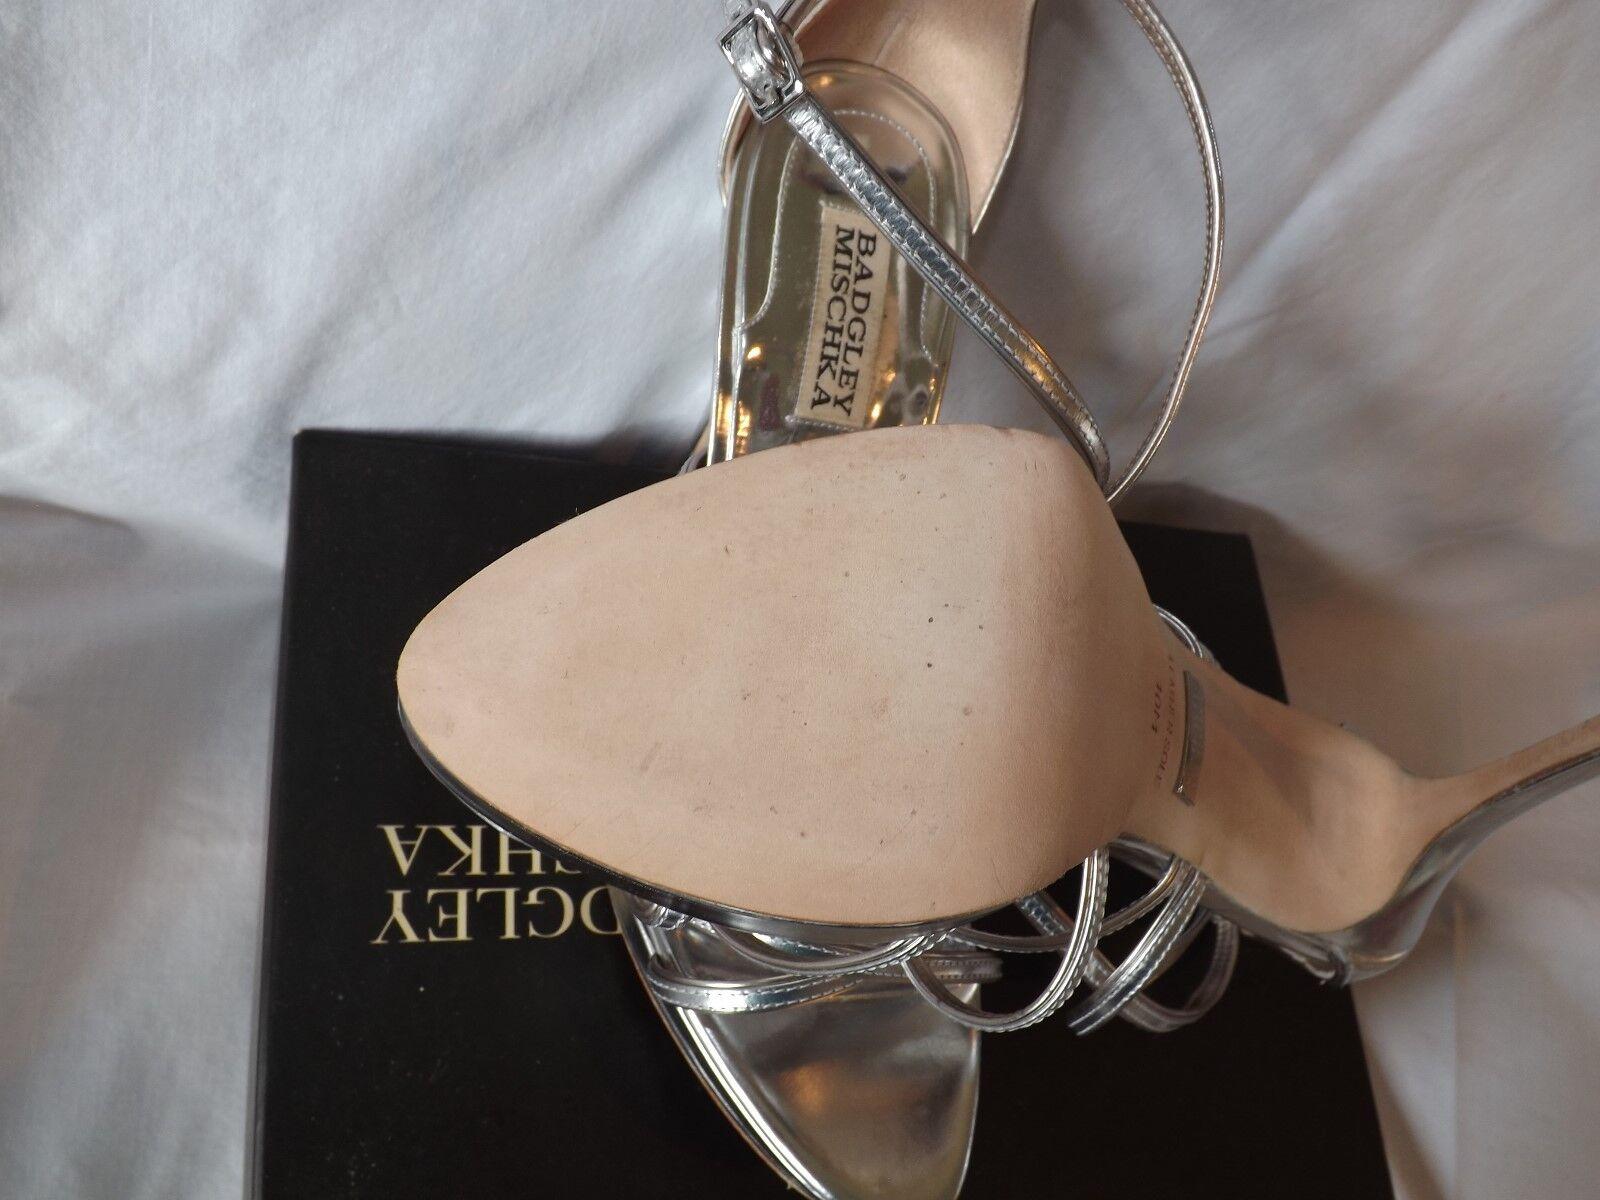 BADGLEY MISCHKA WOMEN'S SILVER Schuhe ZULA WEDDING STRAPPY HEELS Schuhe SILVER 215.00 NIB 10 1e501b